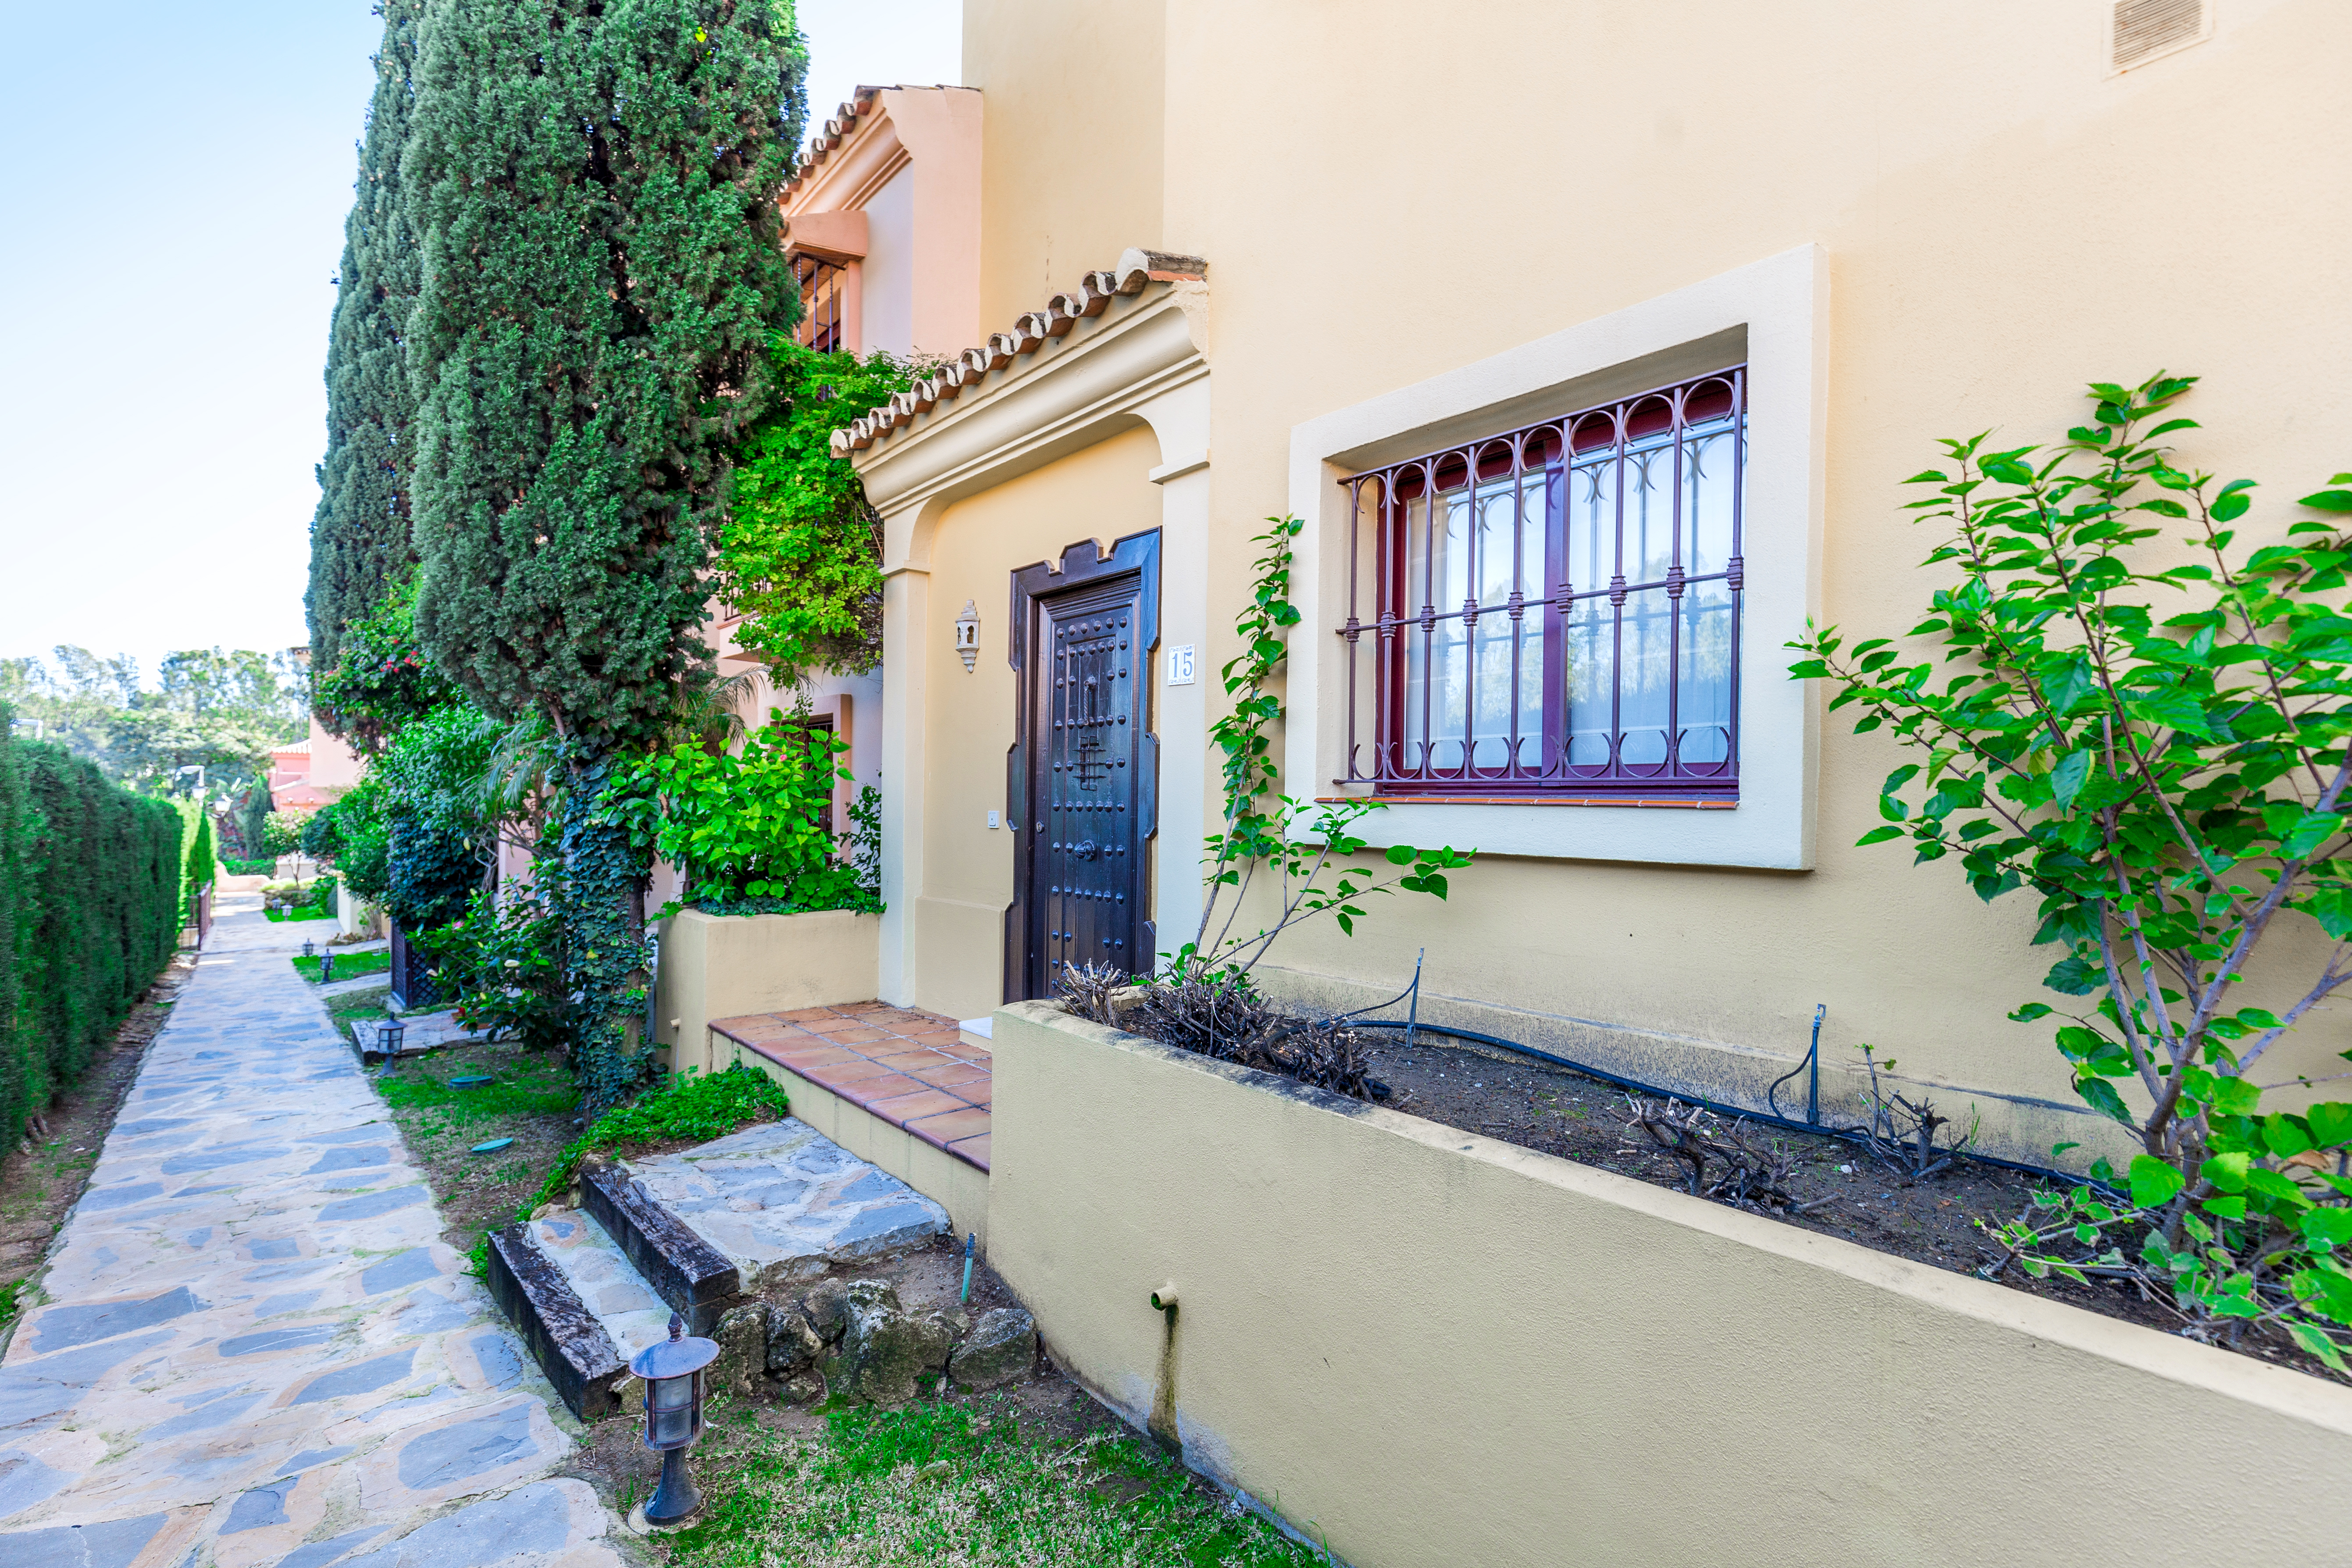 3 Bedrooms Marbella Golden Mile